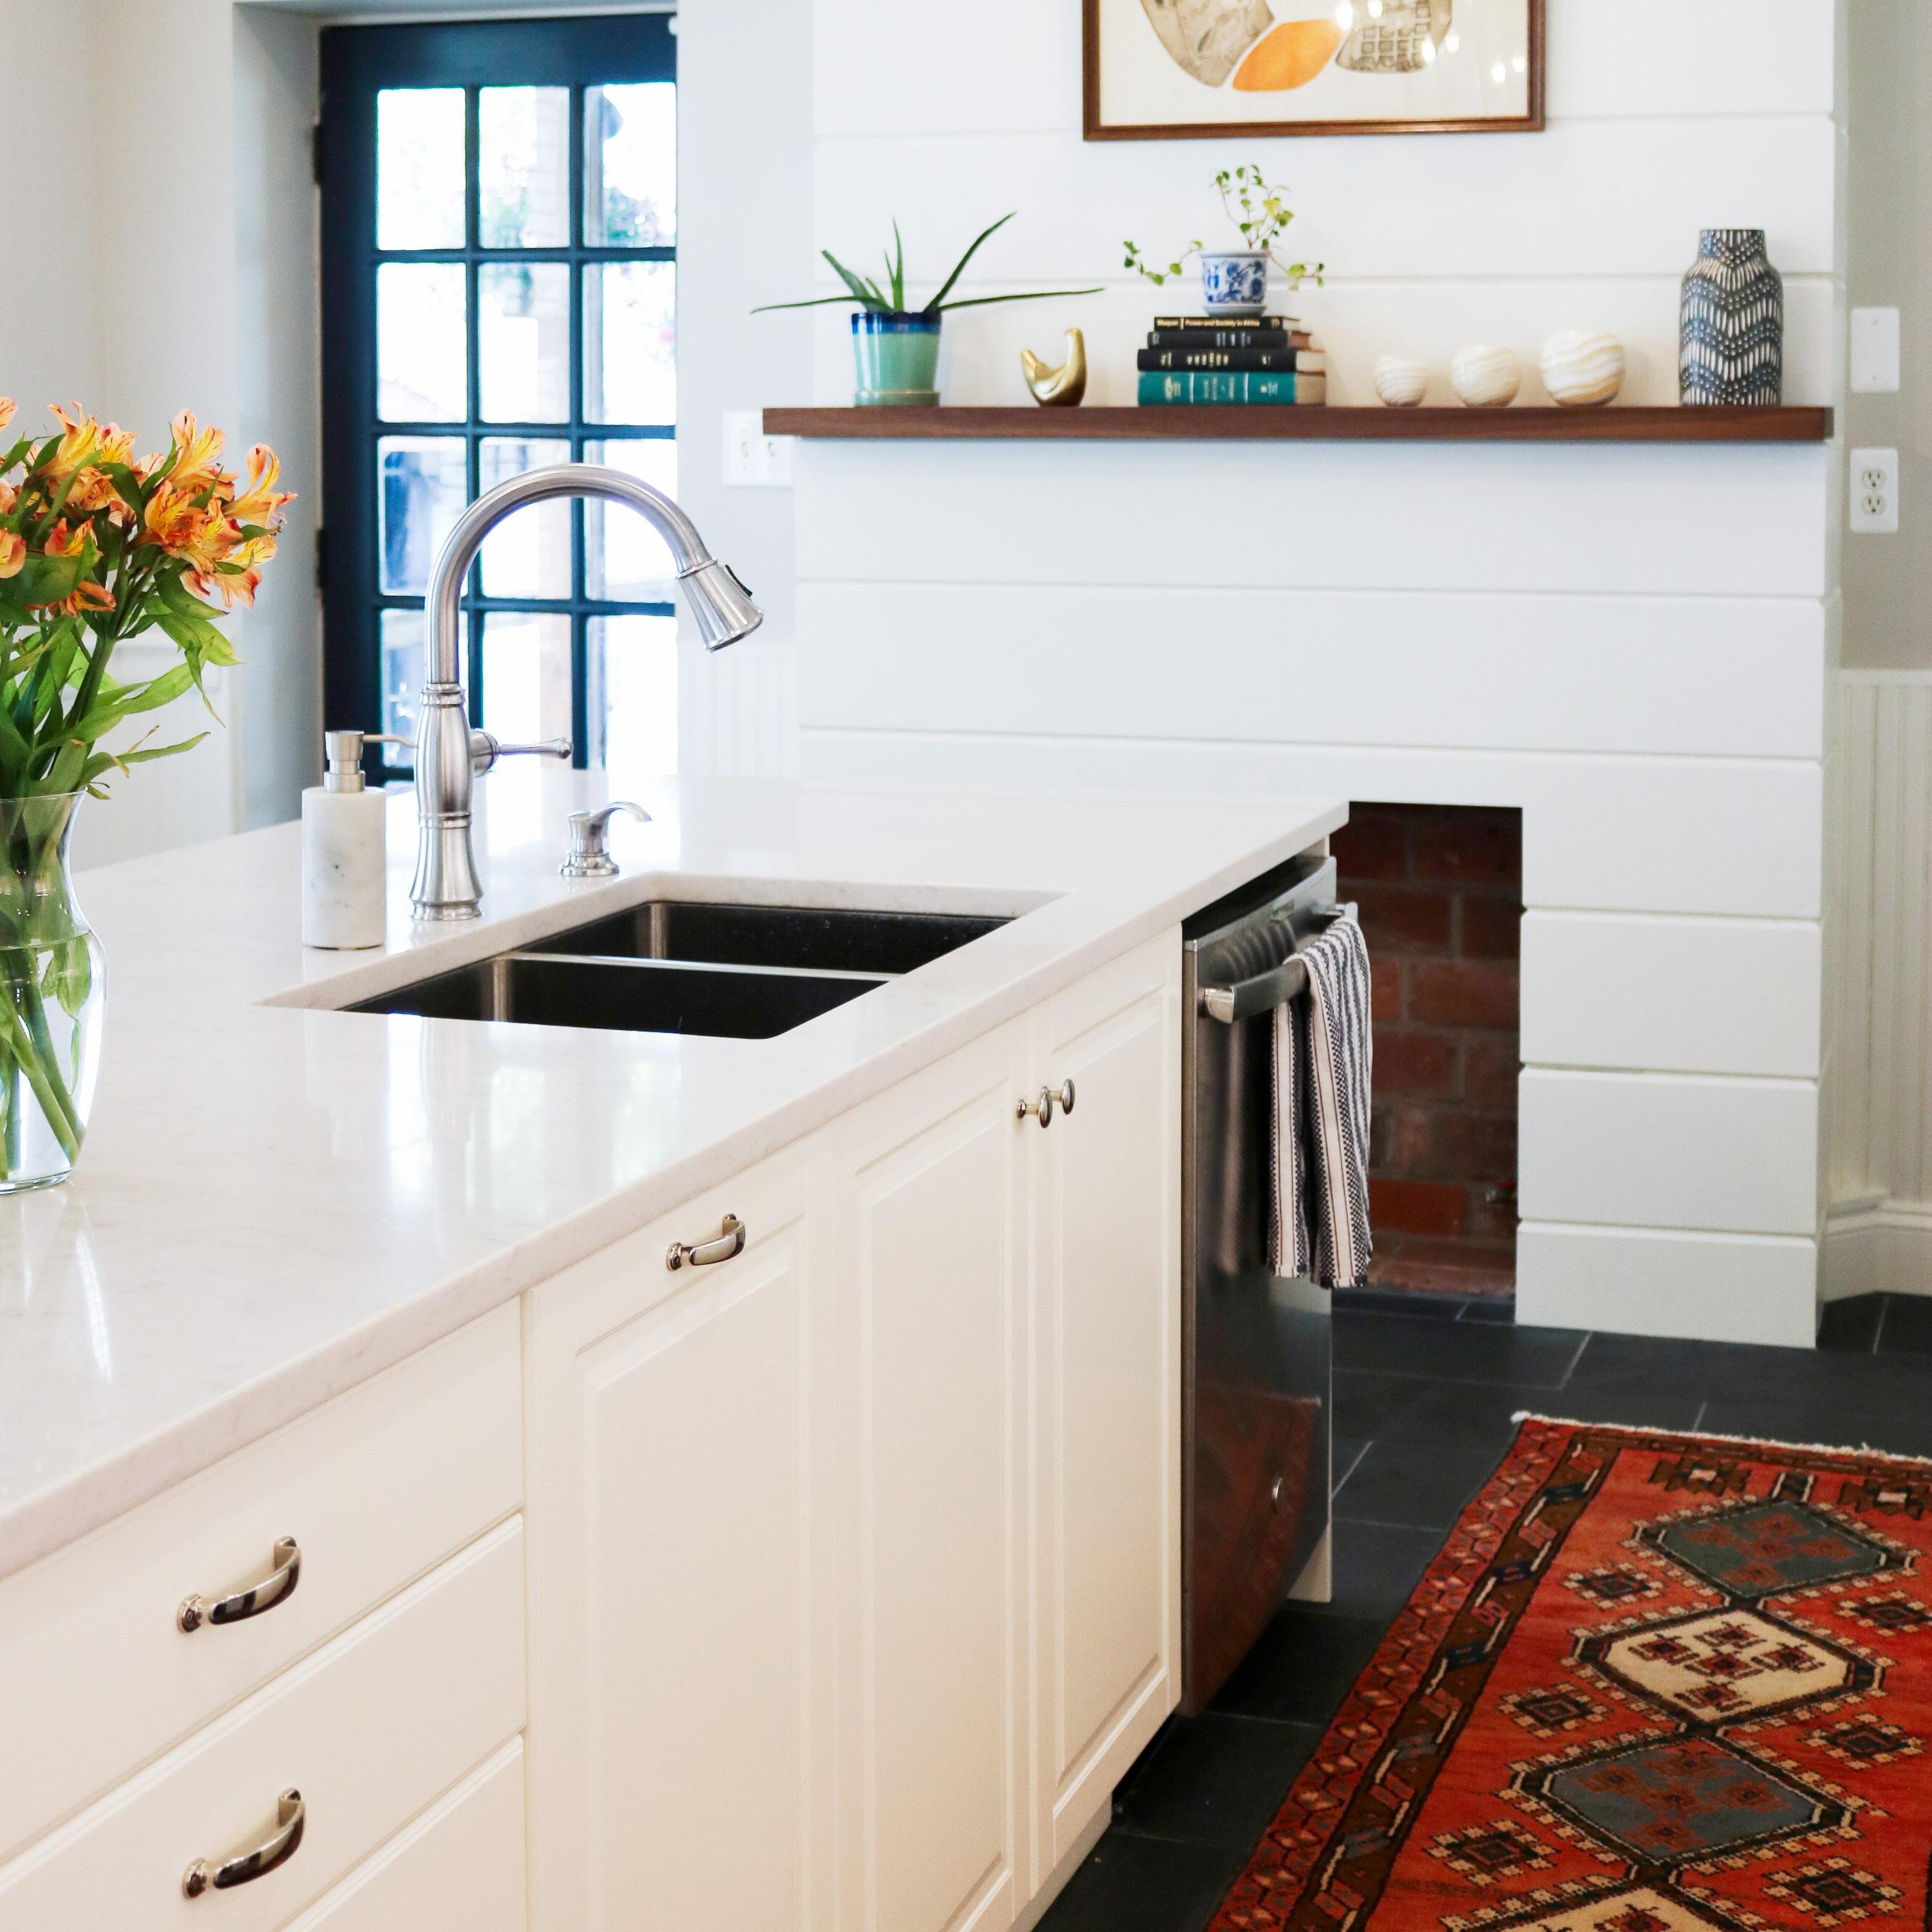 e-Design IKEA Kitchen Plan - Jillian Lare Interior Design